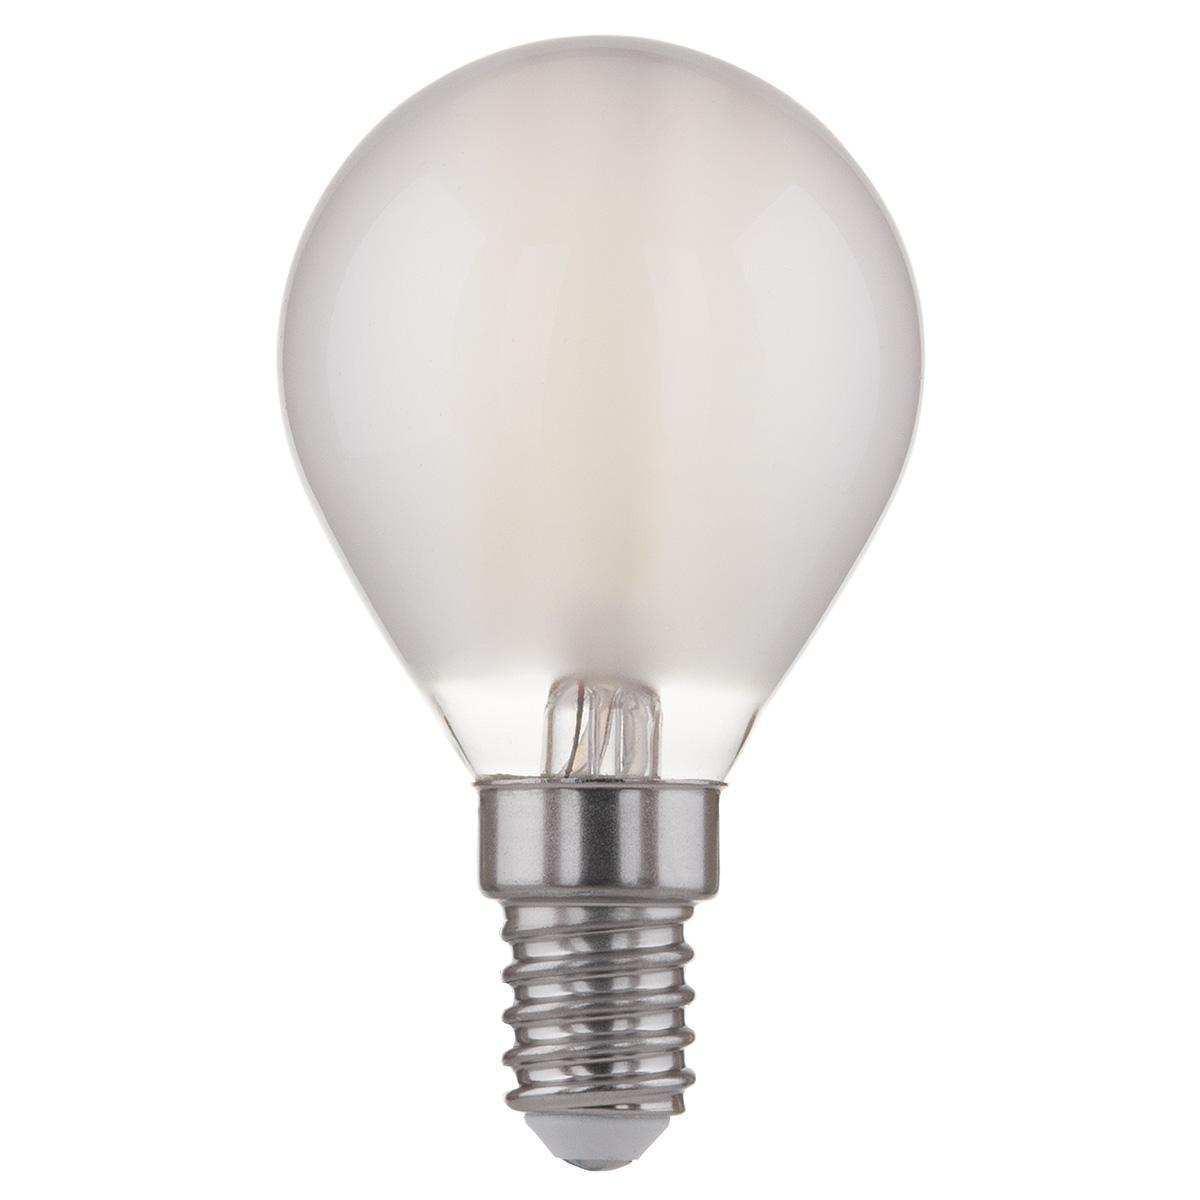 Лампа светодиодная филаментная F E14 6W 4200K матовая 4690389108310 lightstar лампа светодиодная lightstar кукуруза прозрачная e14 6w 4200k 940354